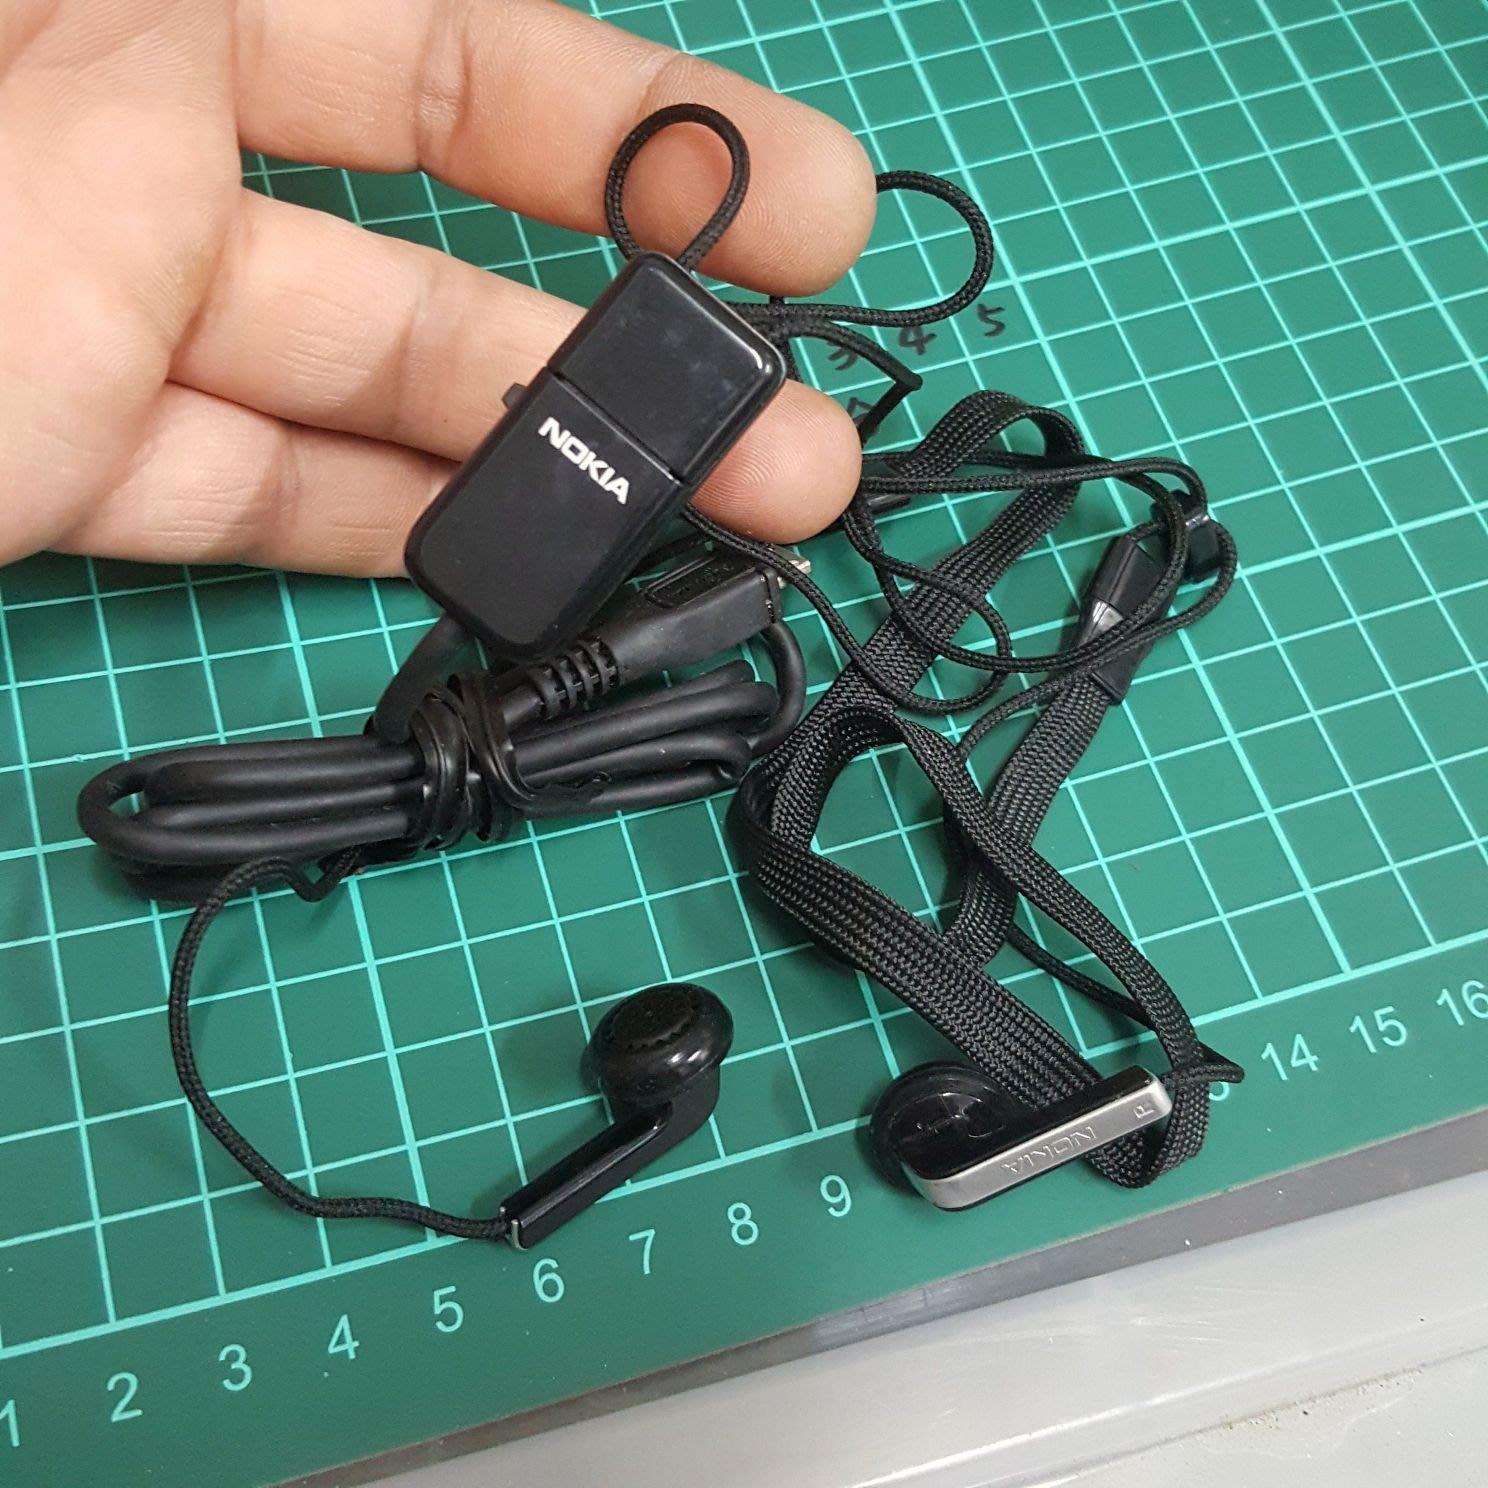 nokia hs-82 原廠耳機 甚麼都有 汽車導航 mp3 手錶 開關 搖控器 電工鉗 電錶 收納盒 N箱 Htc Asus Mp3 MP4 Samsung